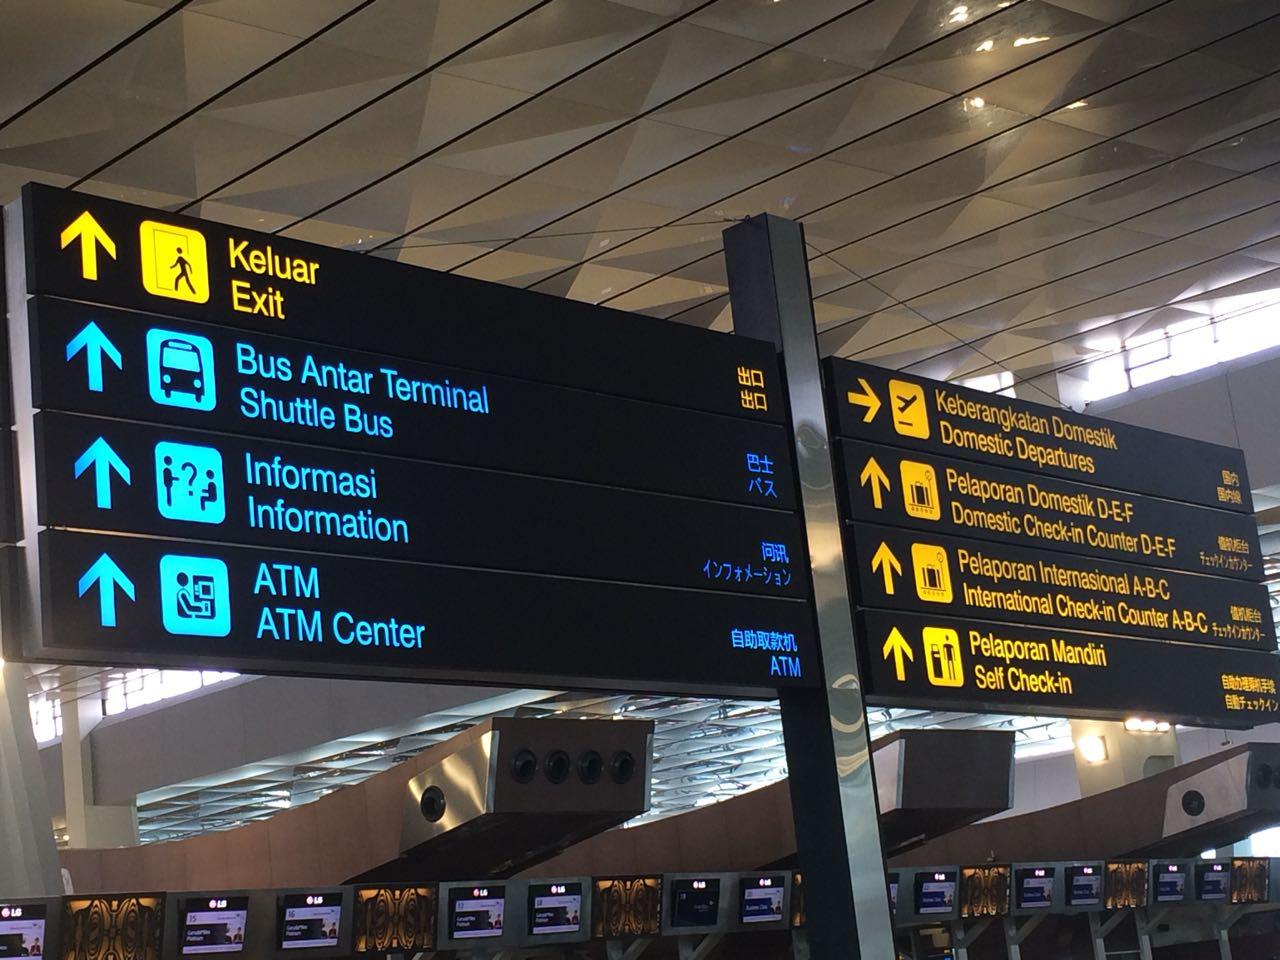 https: img.okeinfo.net content 2019 01 11 320 2003239 ap-ii-targetkan-kapasitas-penerbangan-200-000-penumpang-tahun-di-bandara-soedirman-YdtuHKMmVT.jpg